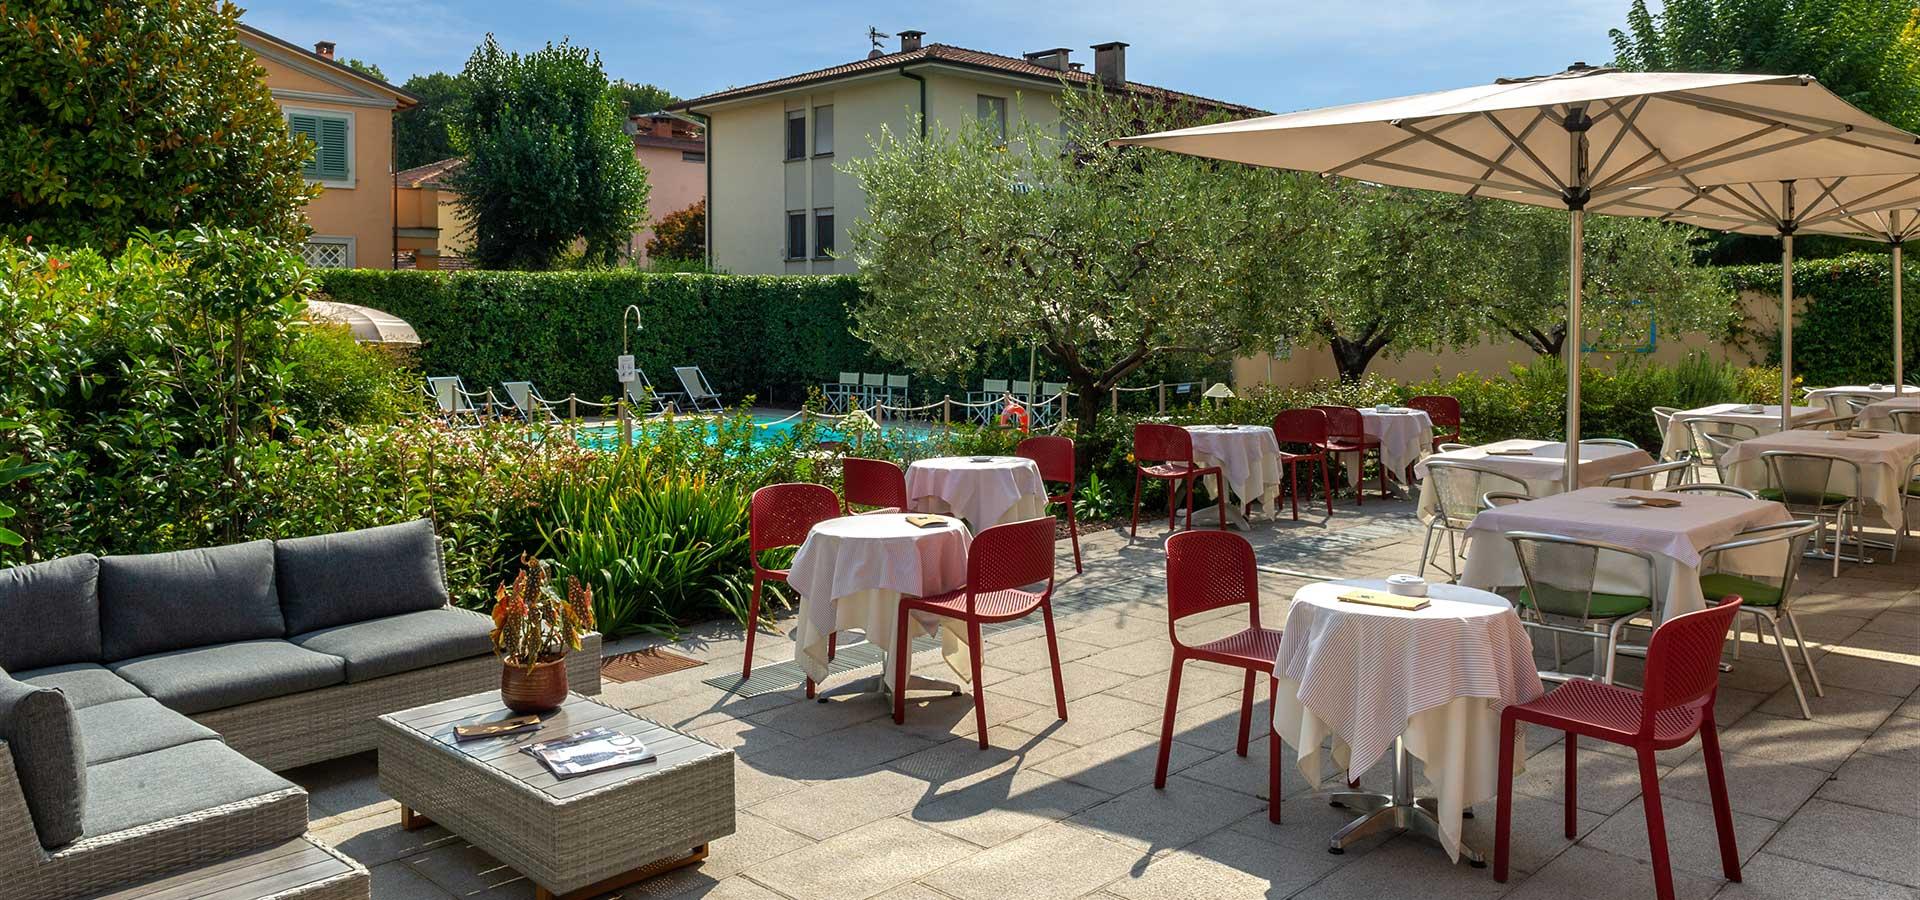 terrazza-Hotel-San-Marco-Lucca